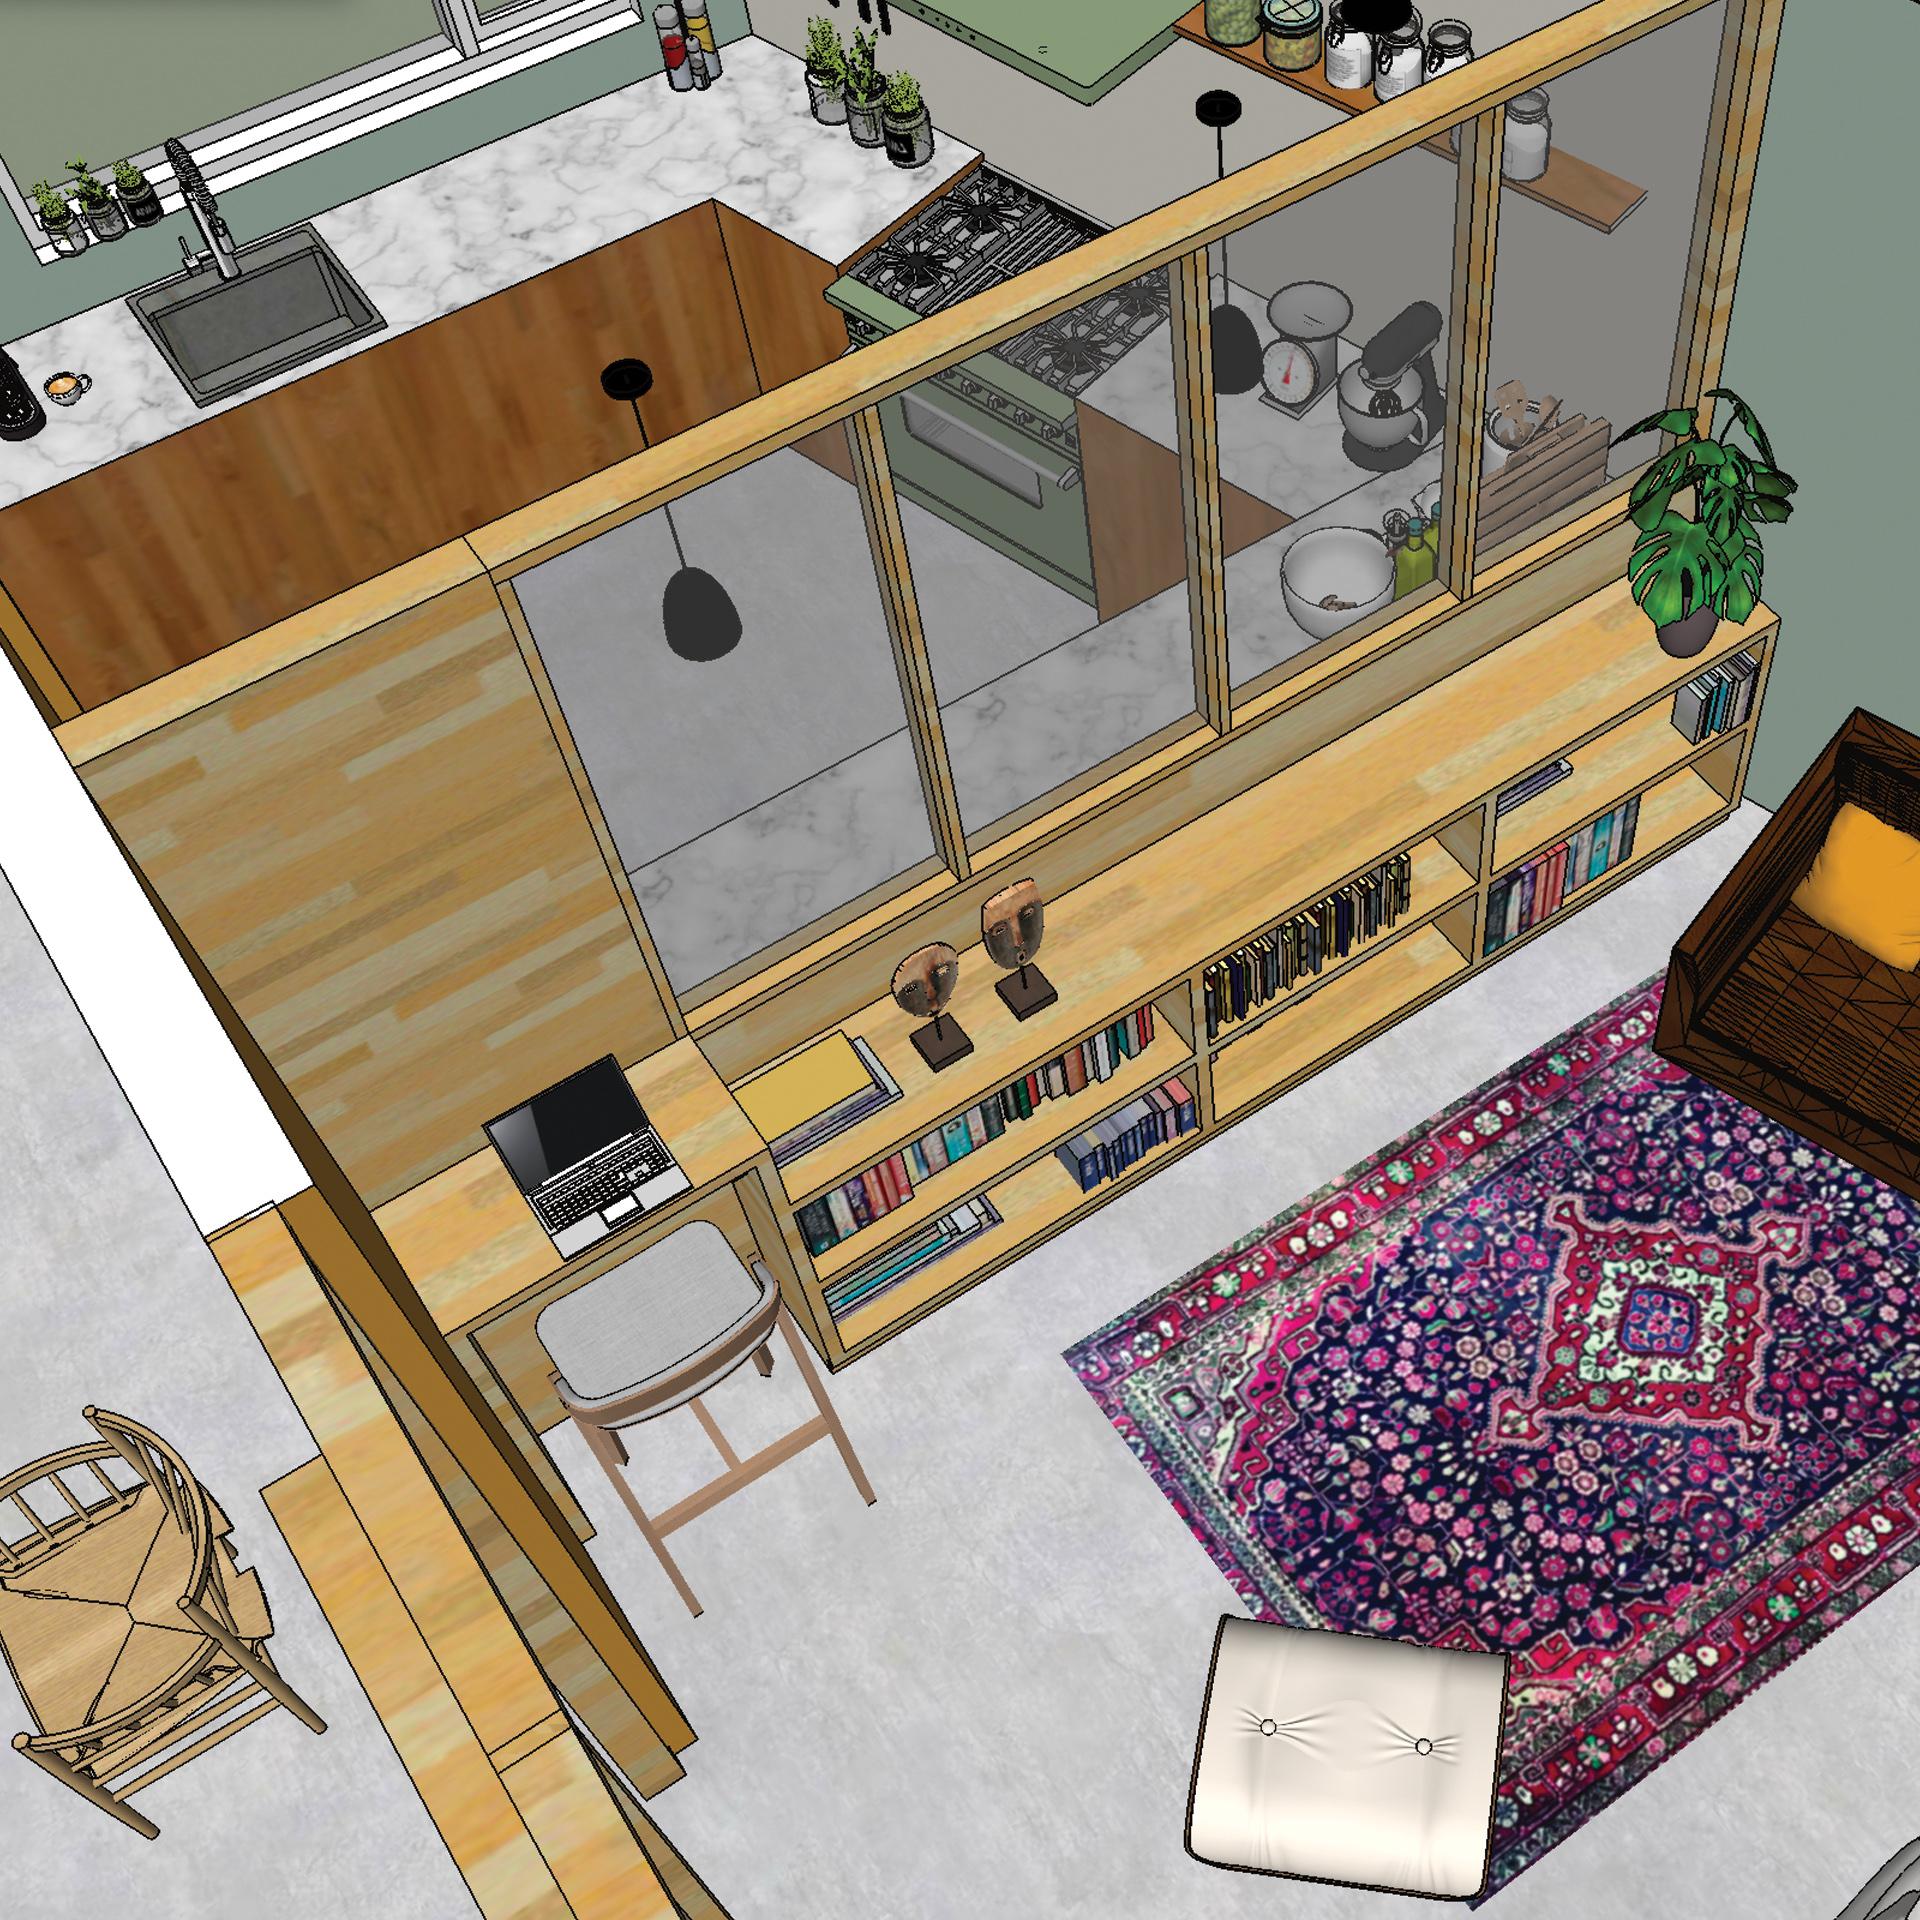 // benedenverdieping duurzaam huis Culemborg